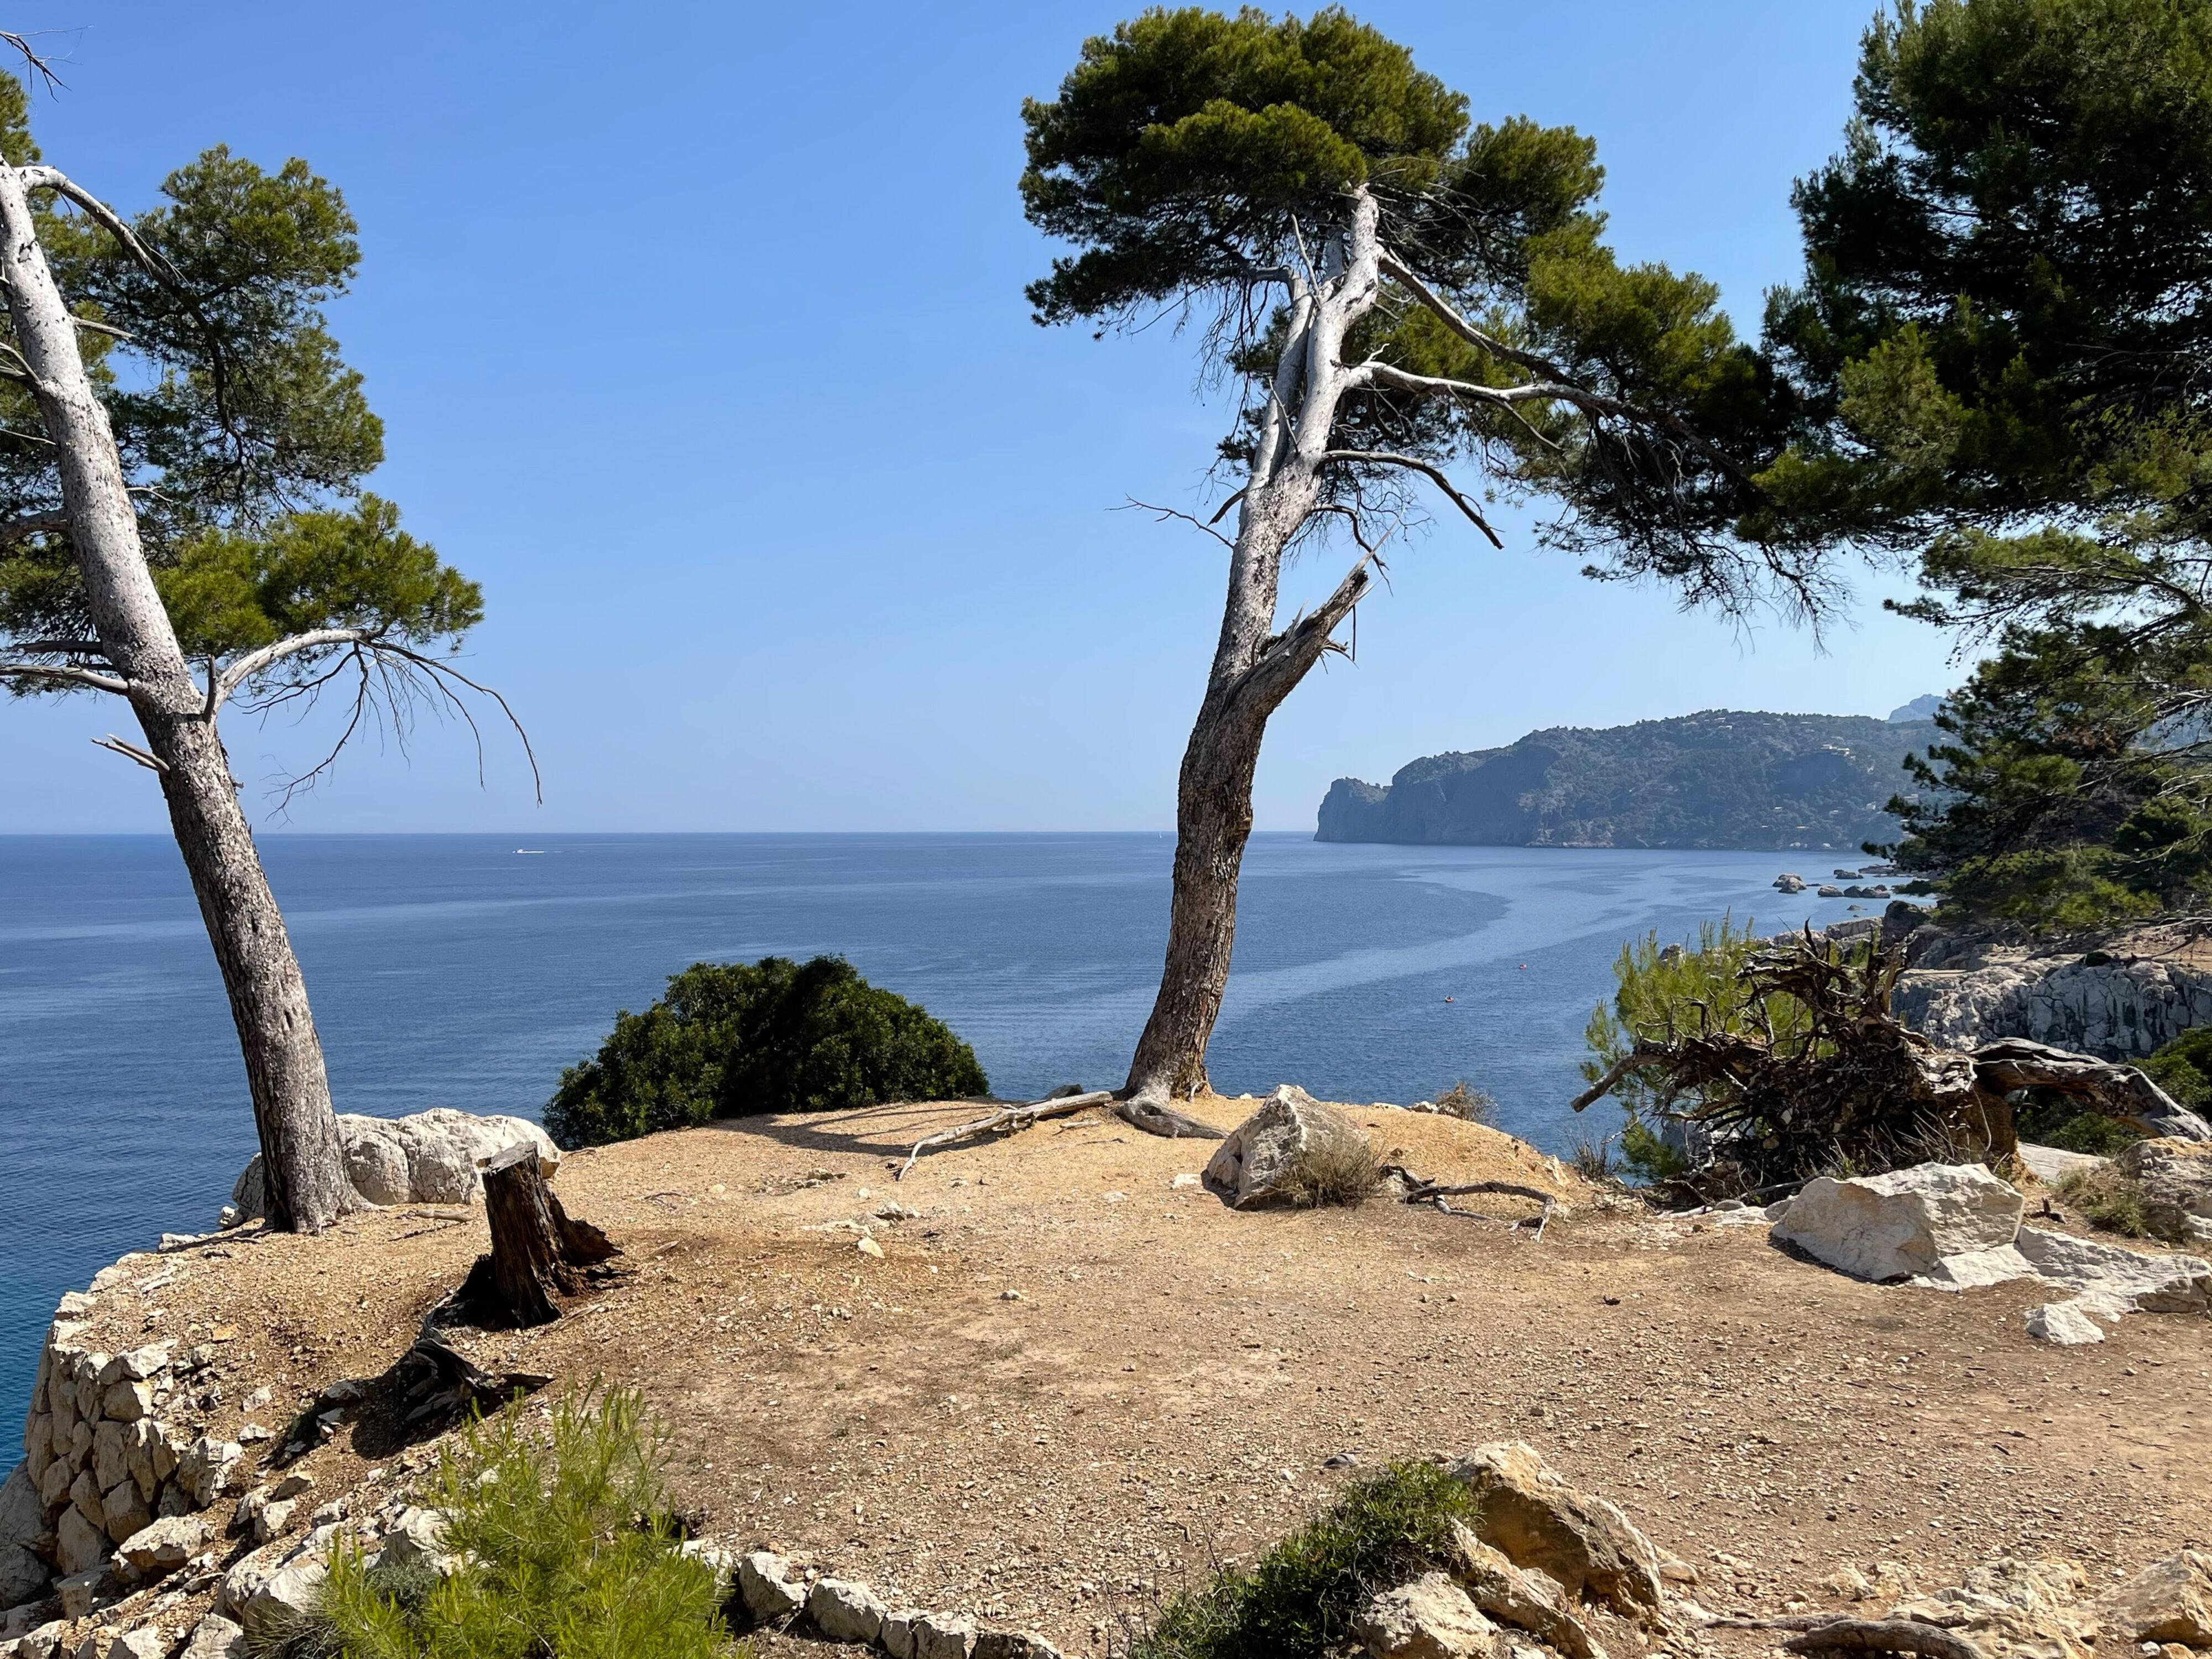 Küstenwanderung Cala de Deià-Llucalcari